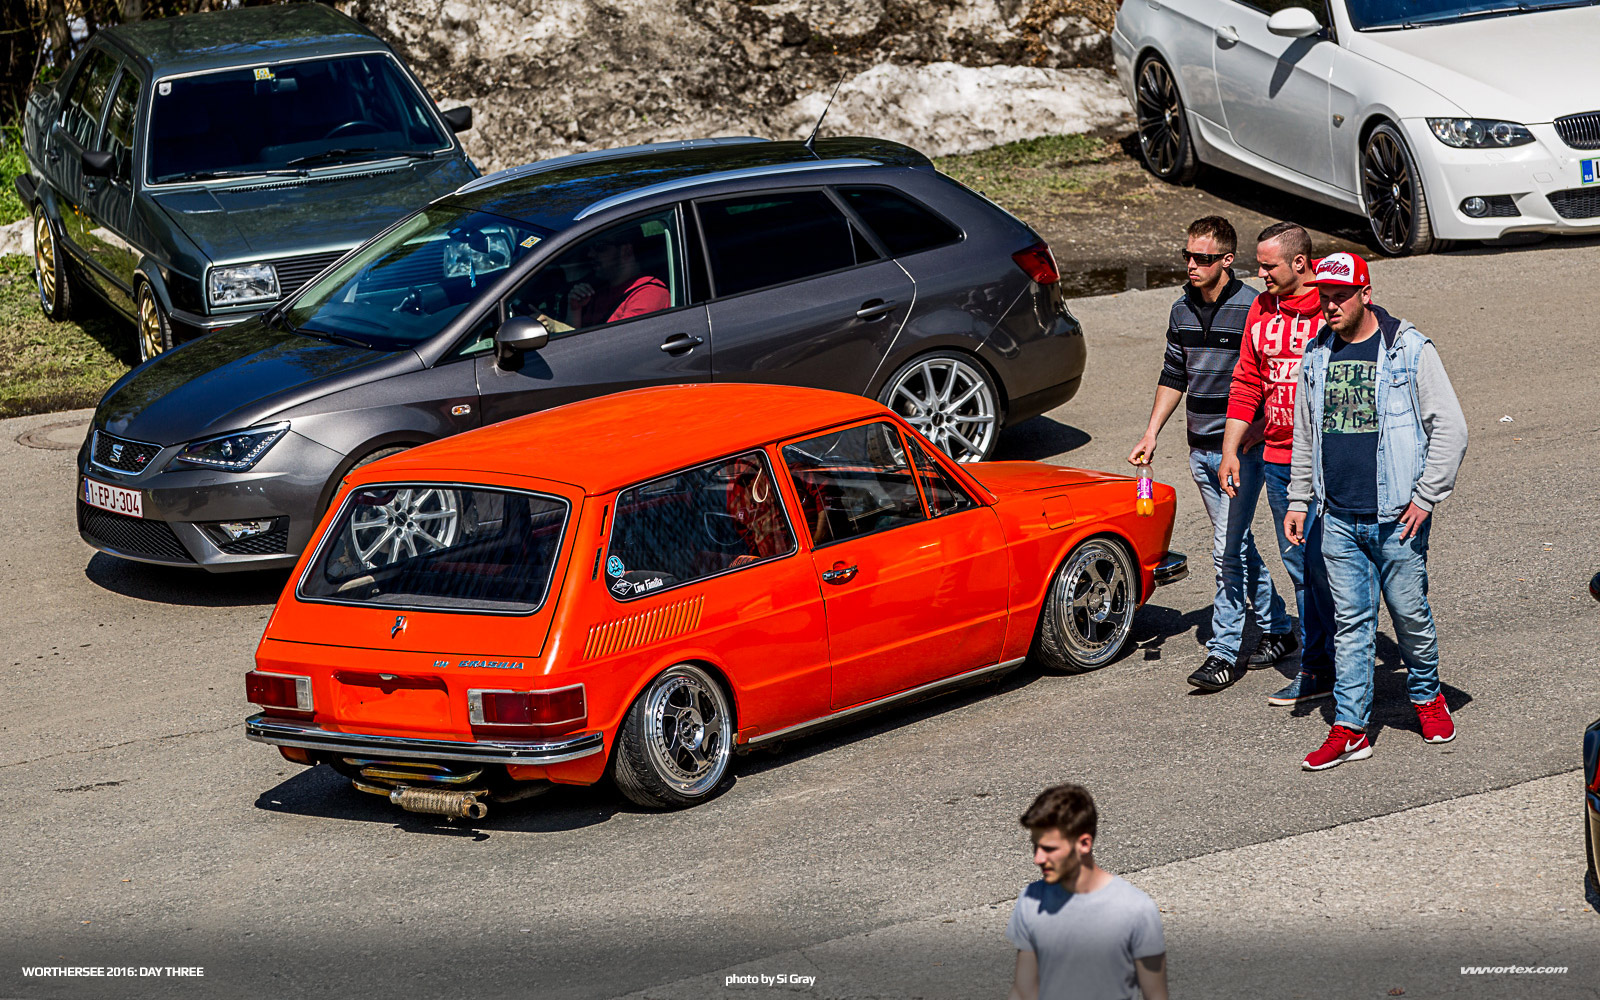 Event: RS Treffen at Audi Forum Ingolstadt